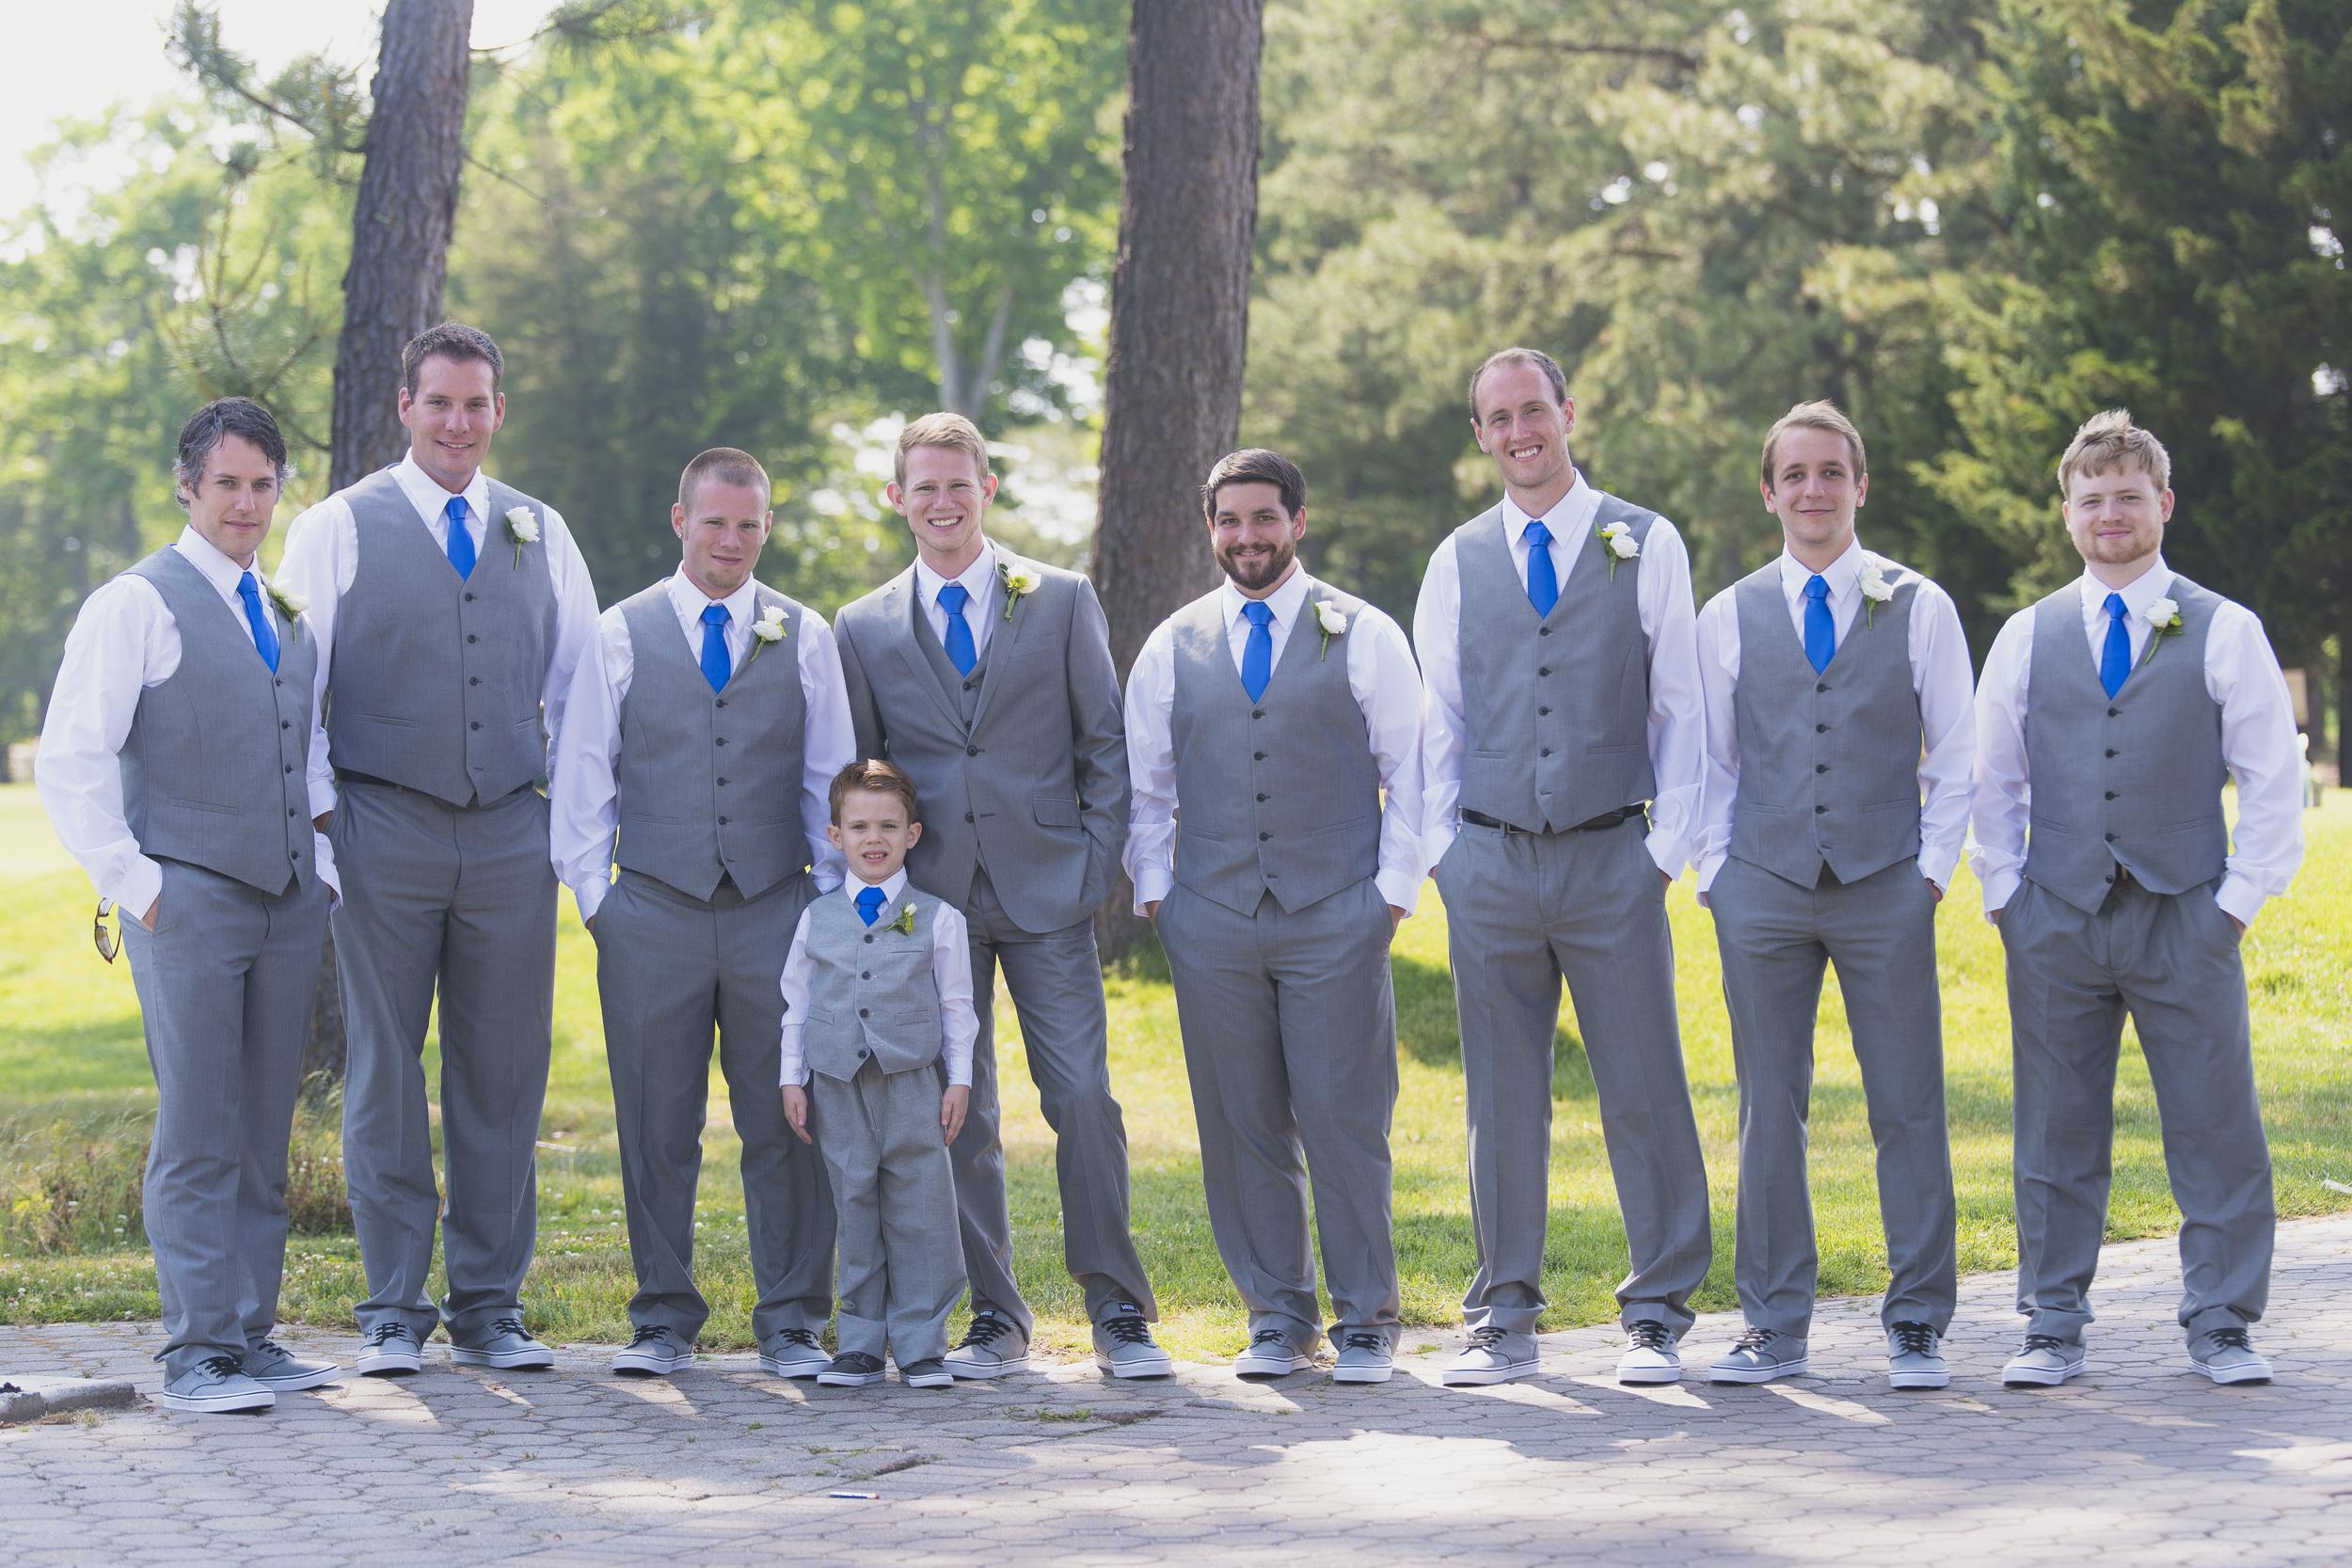 New_jersey_blue_heron_pines_wedding20150529_0536.jpg